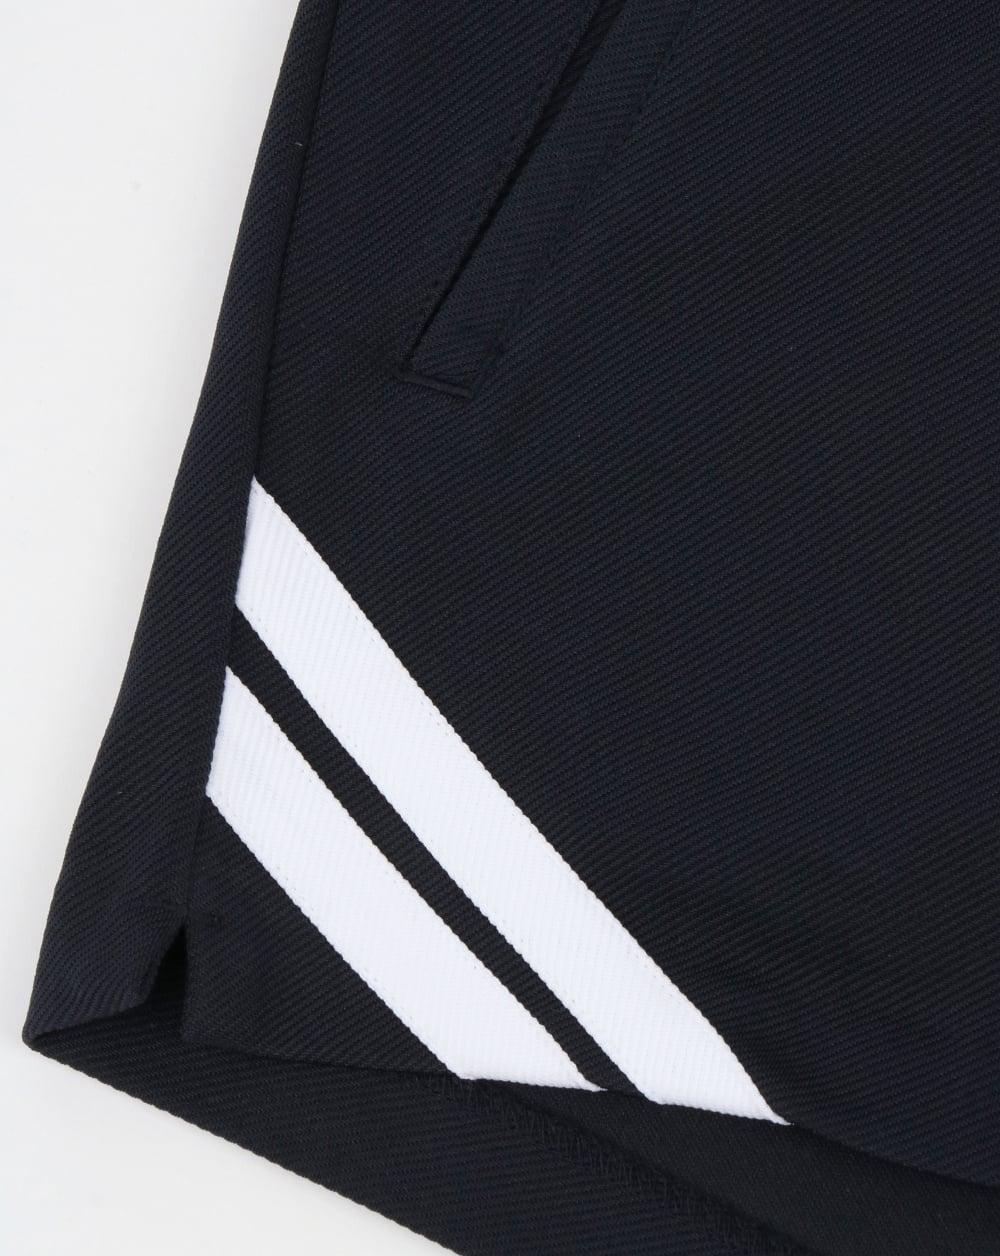 6daea8c2ba156 Sergio Tacchini Time tennis Shorts Navy | 80s casual classics